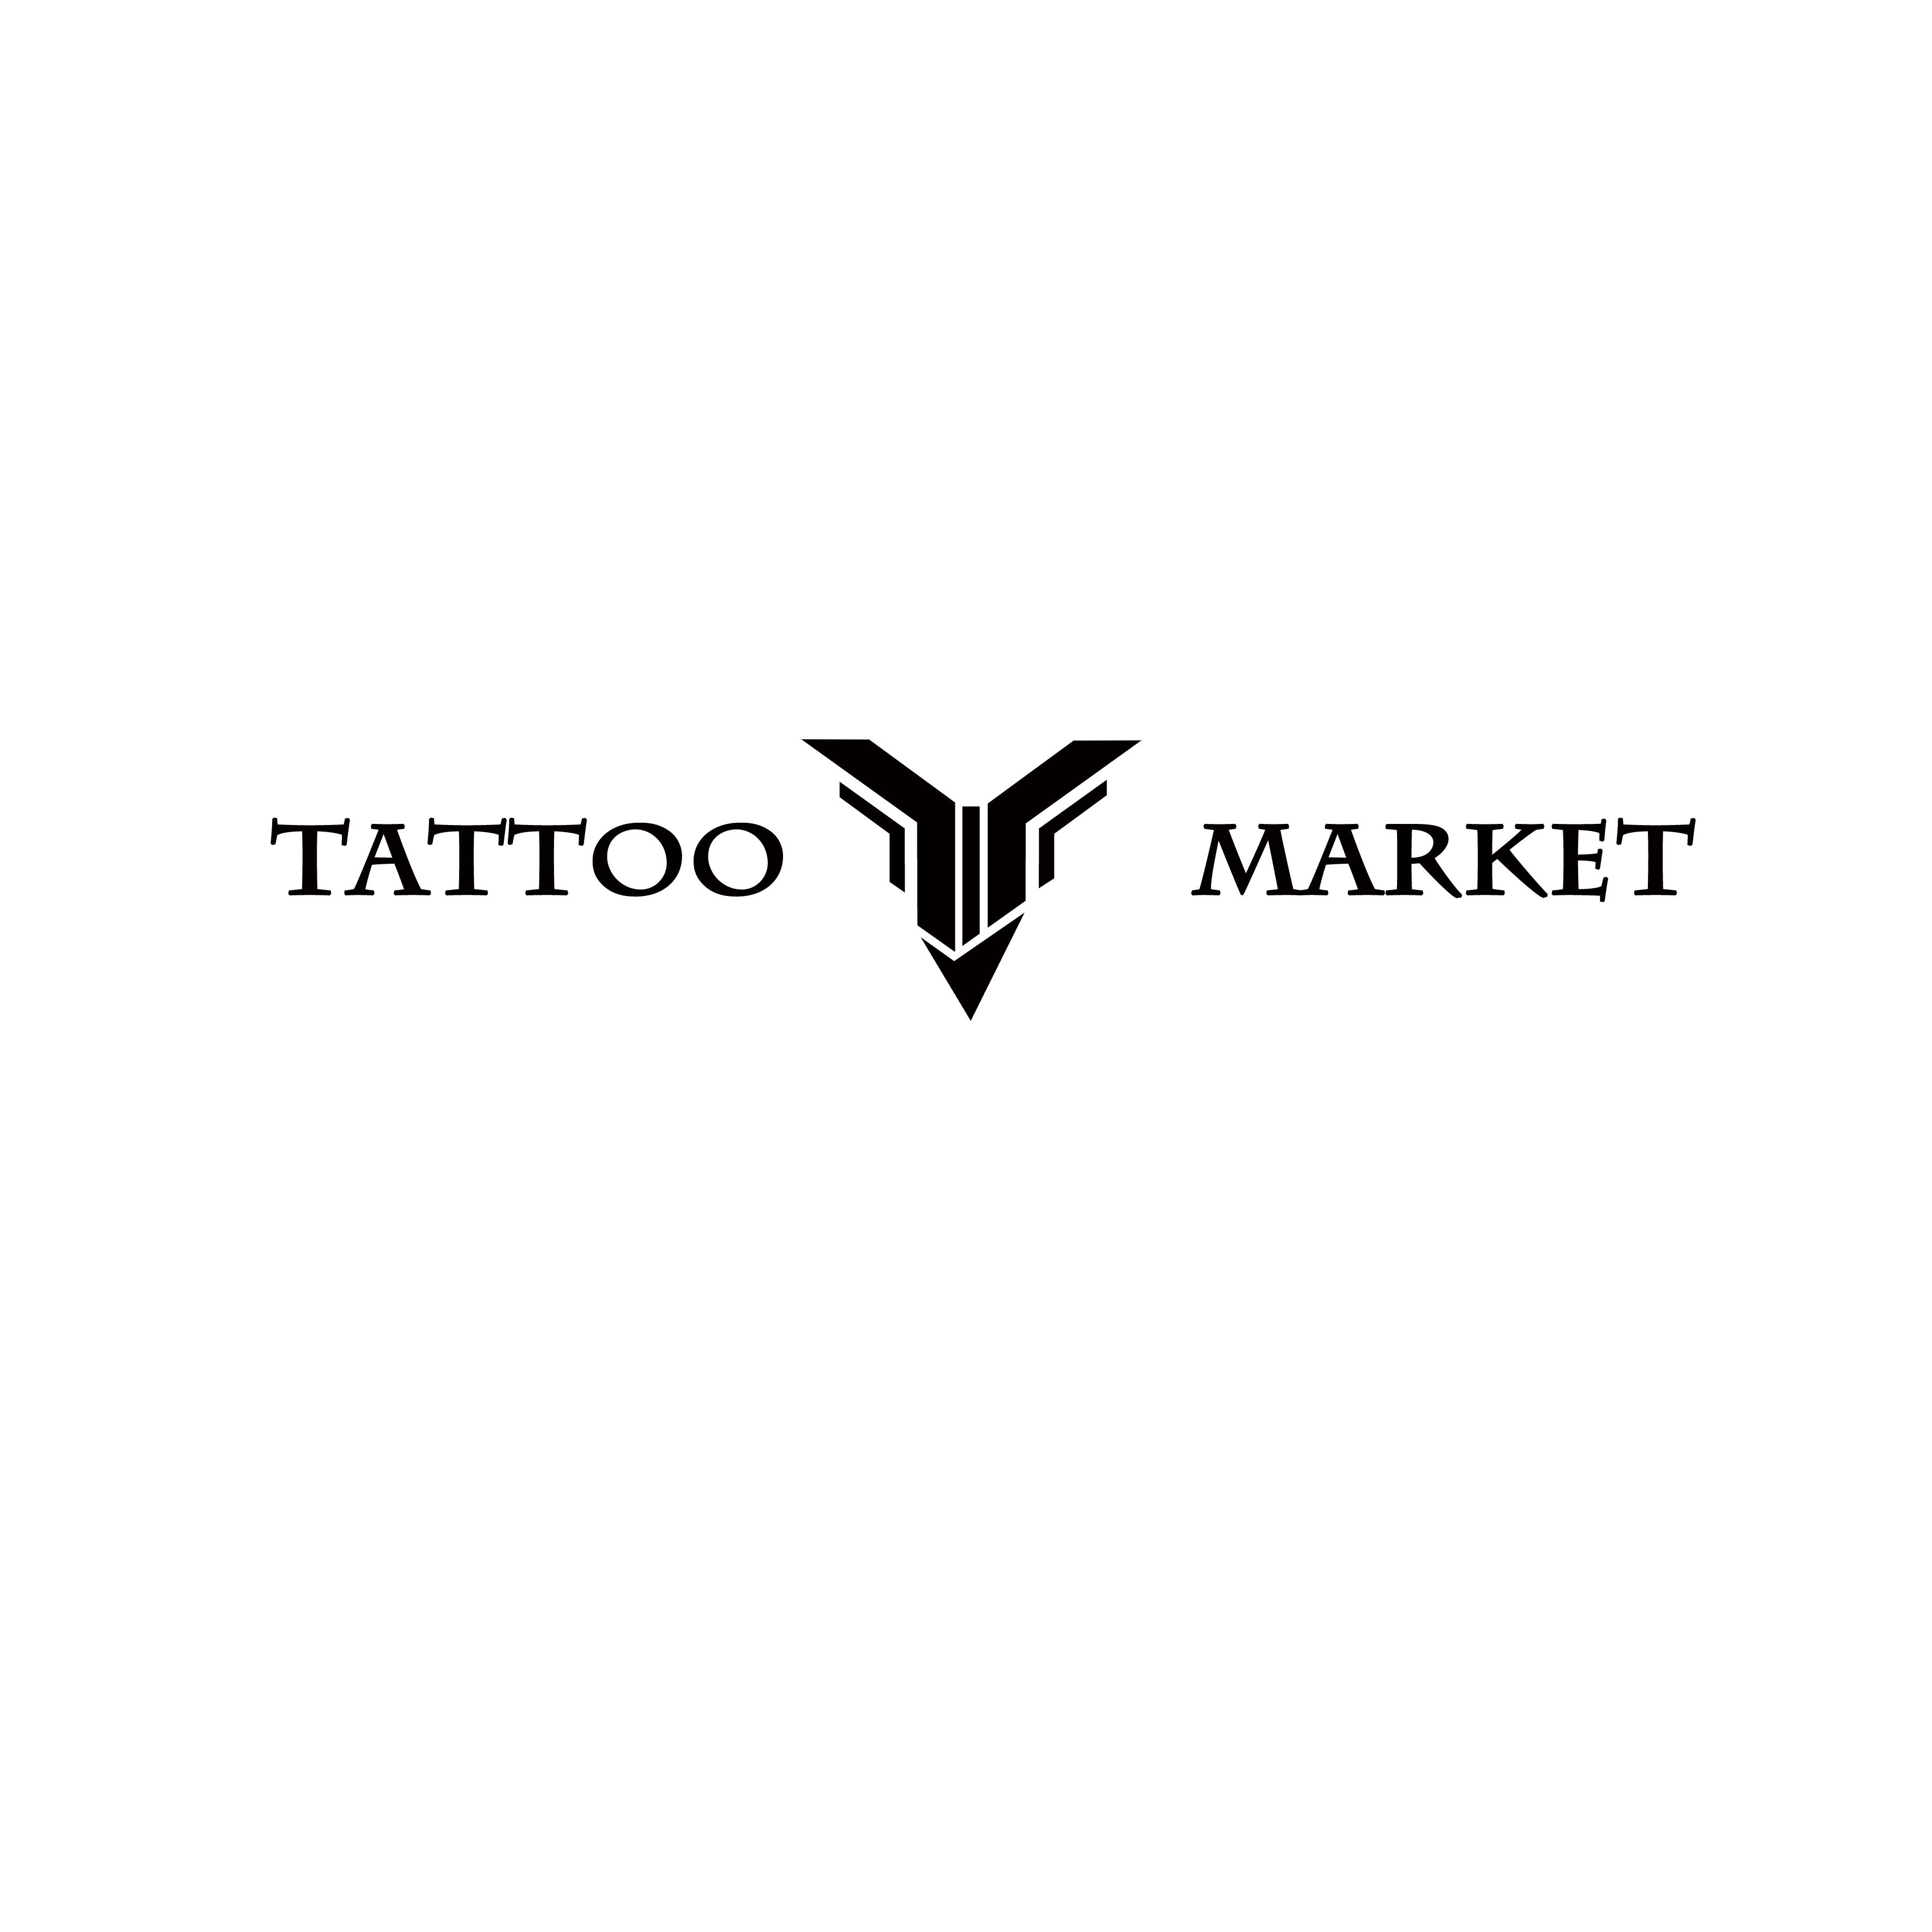 Редизайн логотипа магазина тату оборудования TattooMarket.ru фото f_1125c3a6684ac5c7.jpg